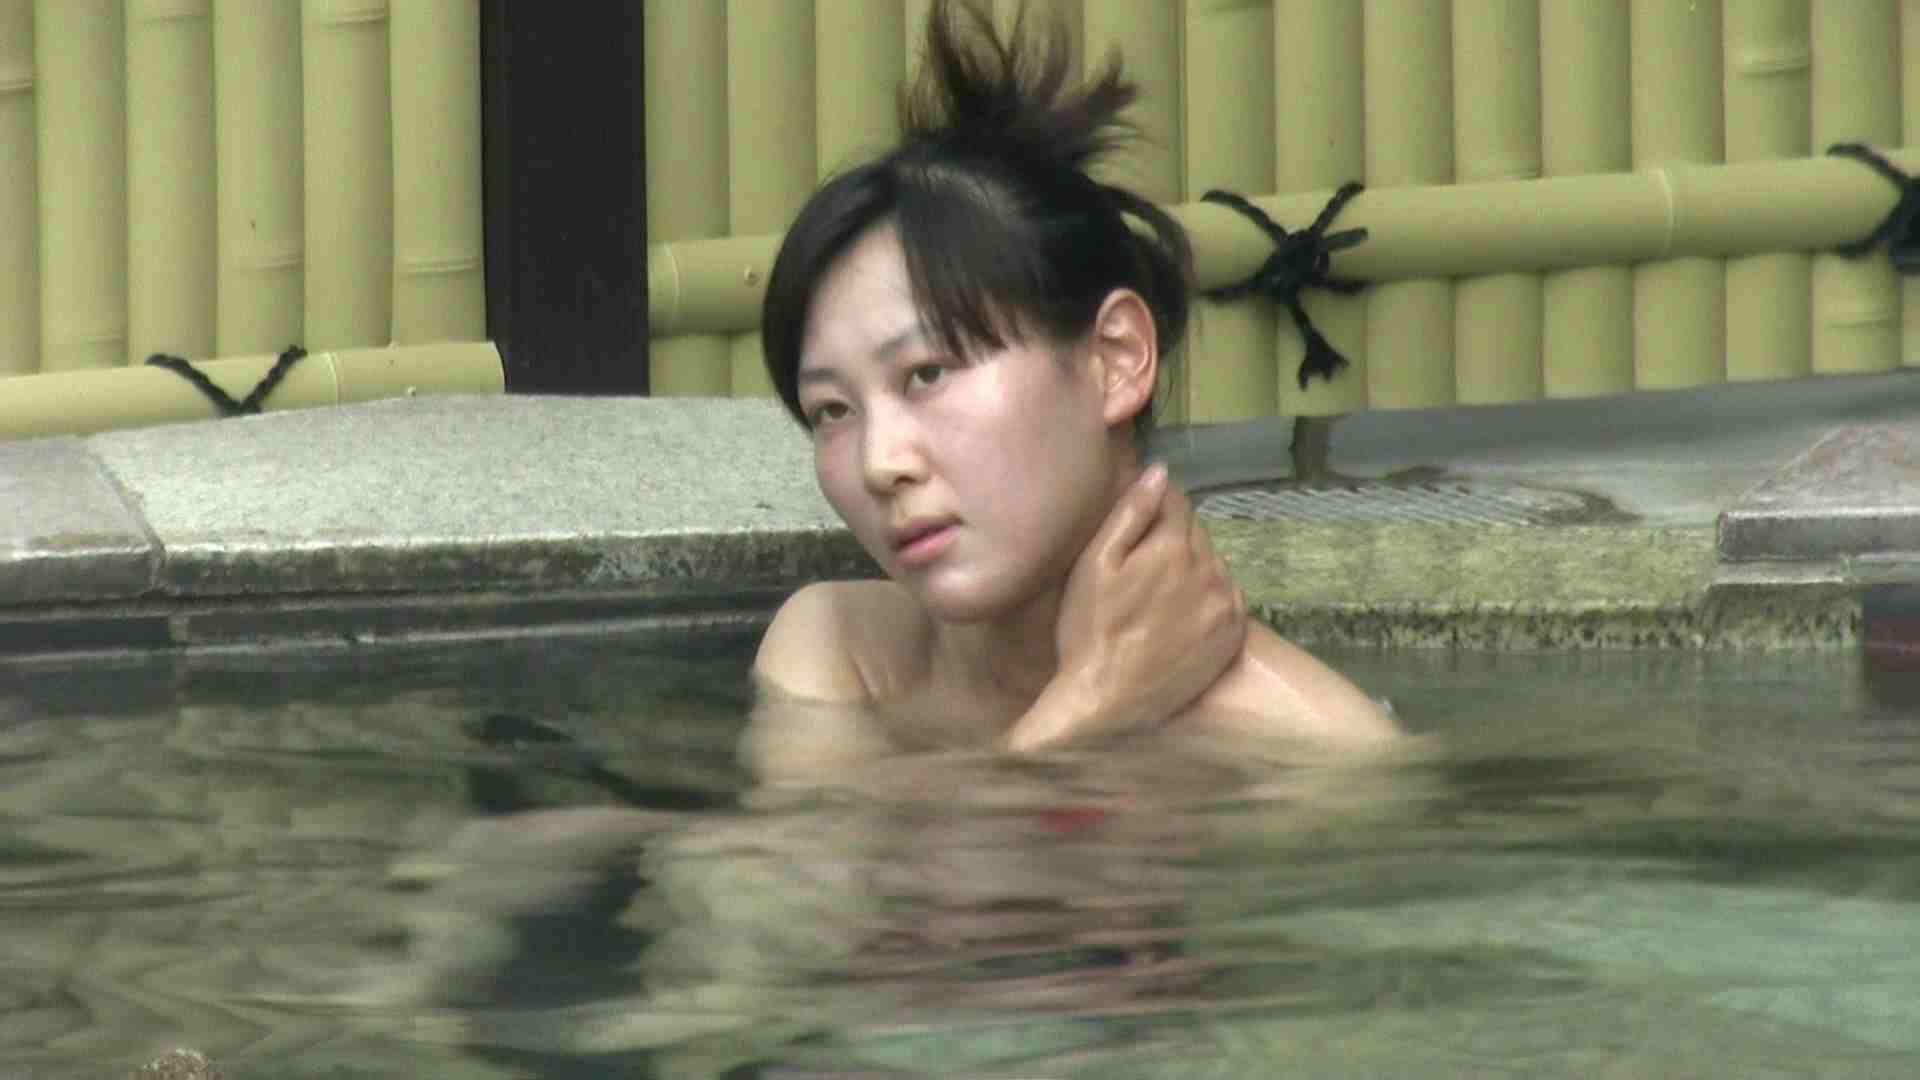 Aquaな露天風呂Vol.665 綺麗なOLたち  85枚 57